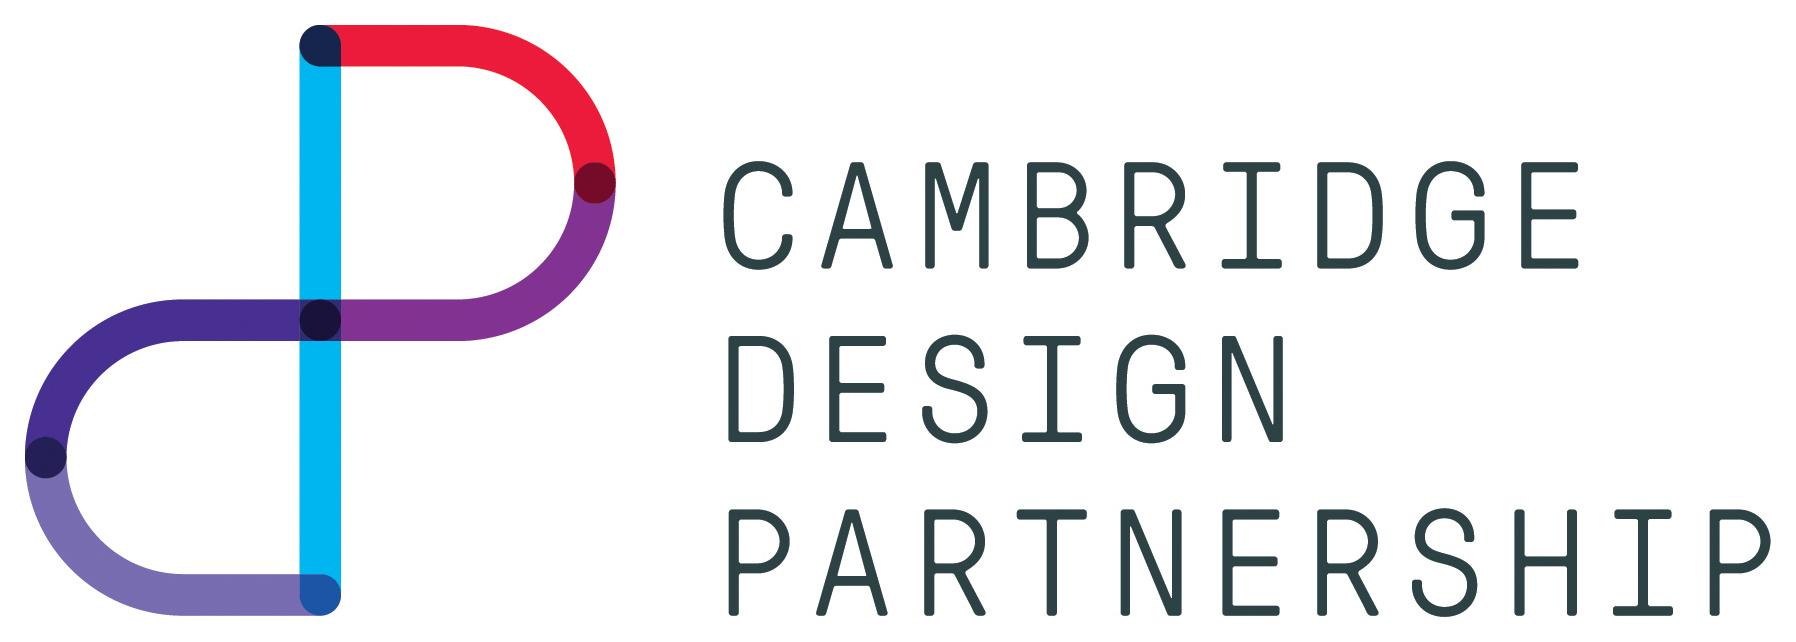 https://www.cambridge-design.co.uk/